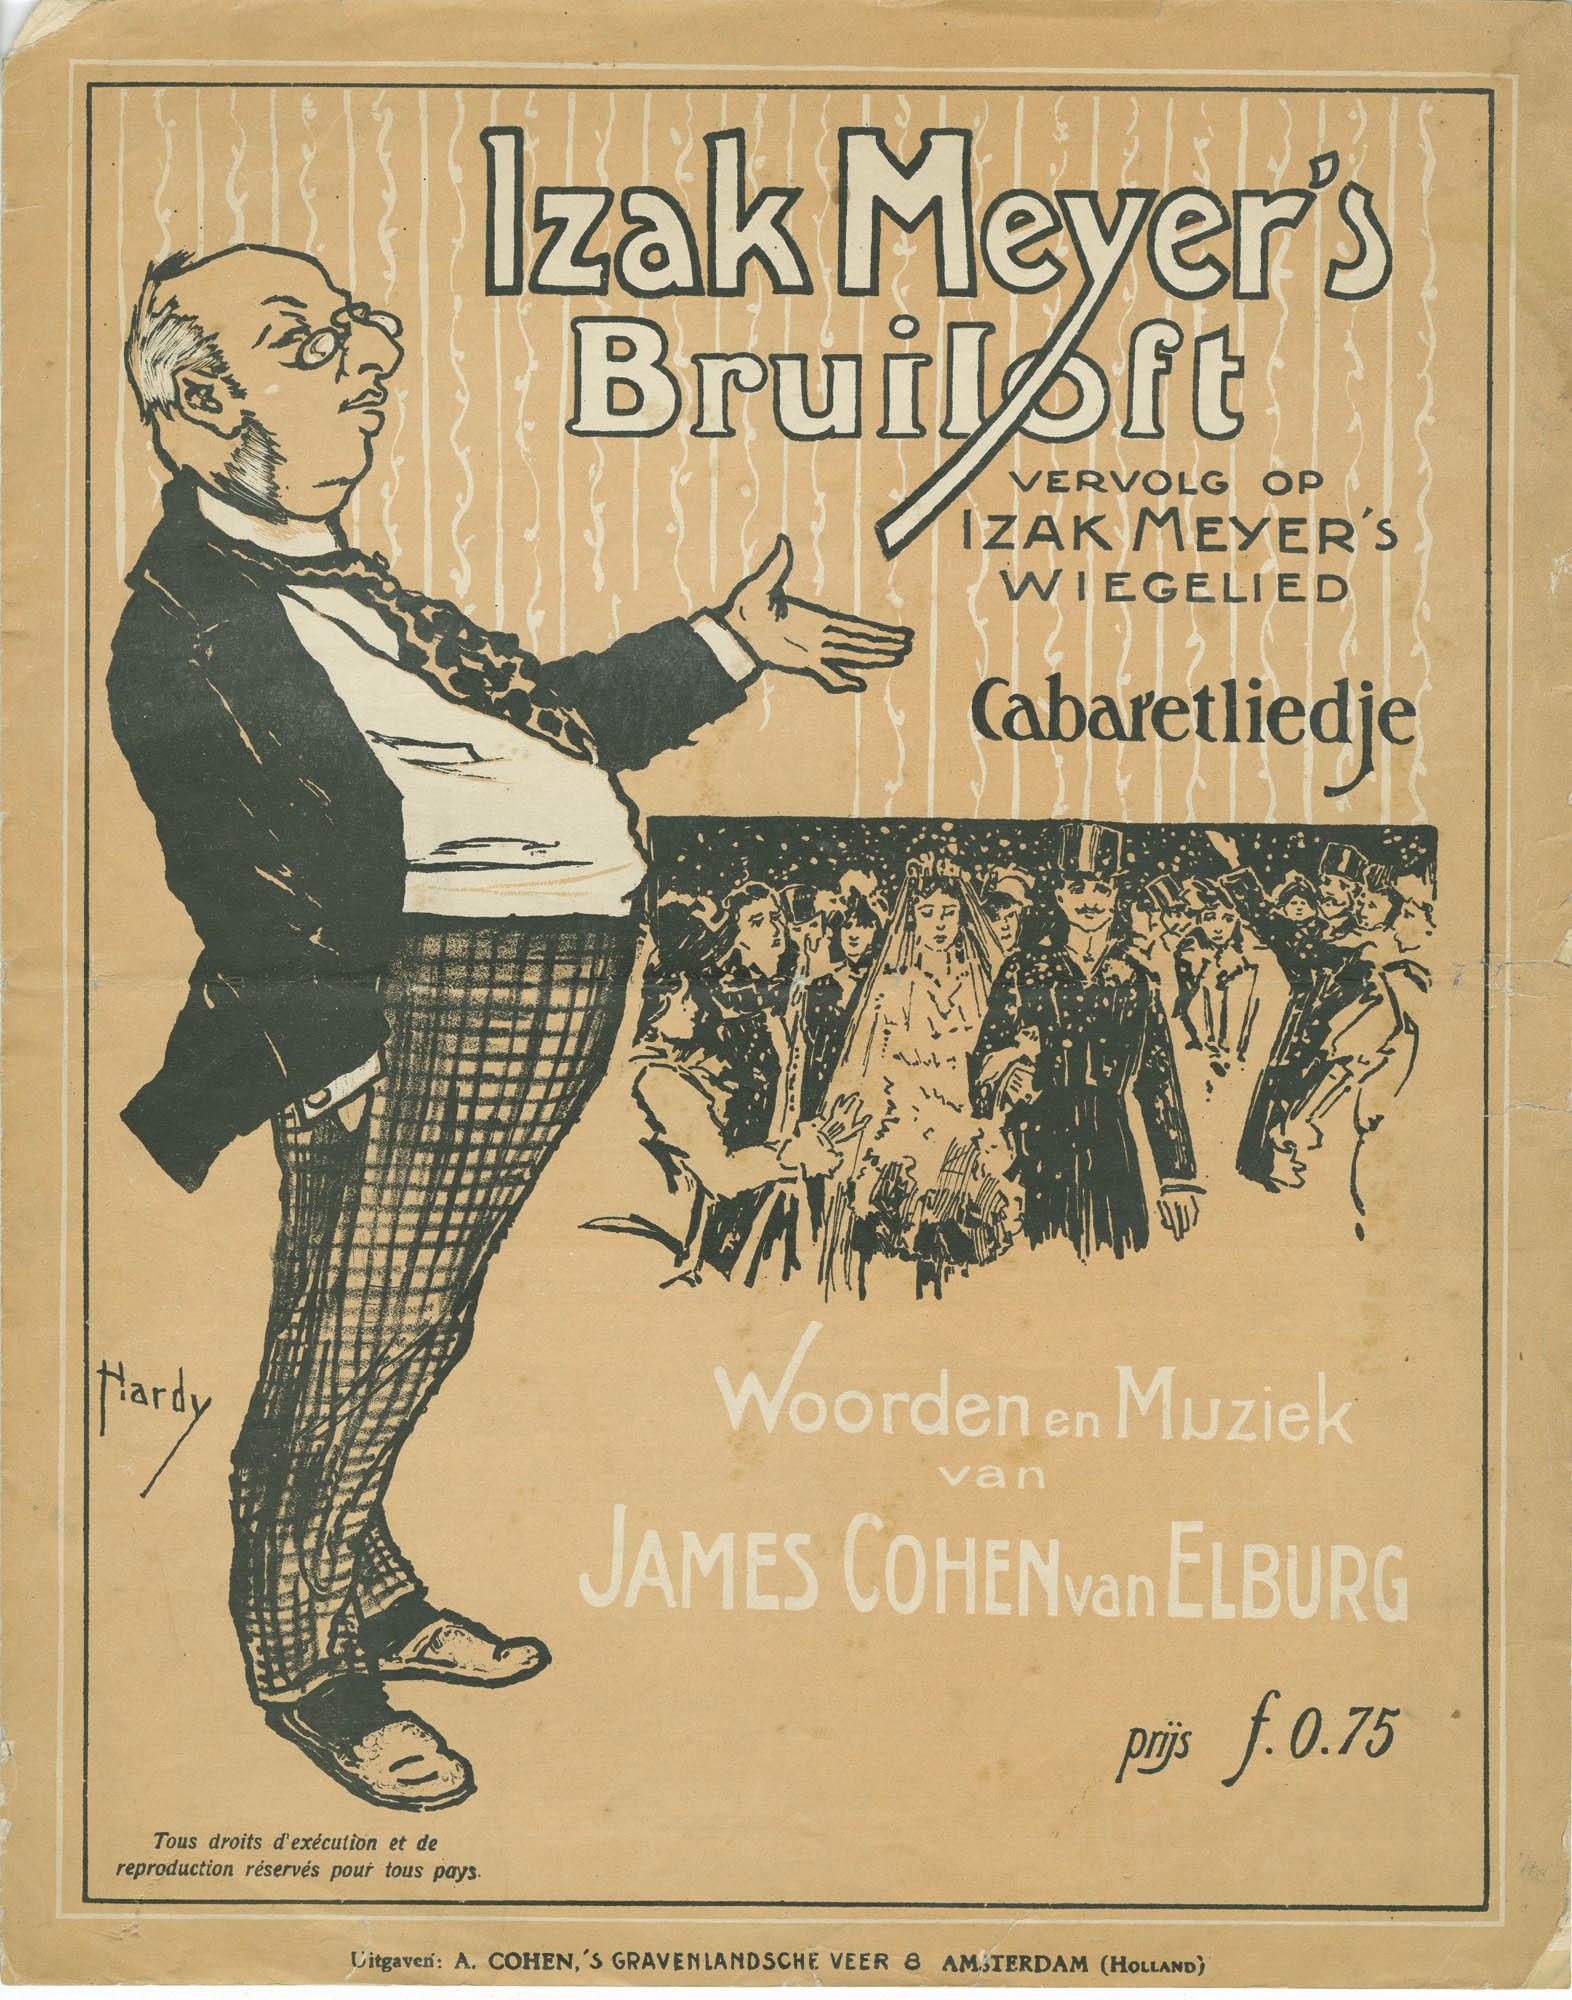 Izak Meyer's bruiloft